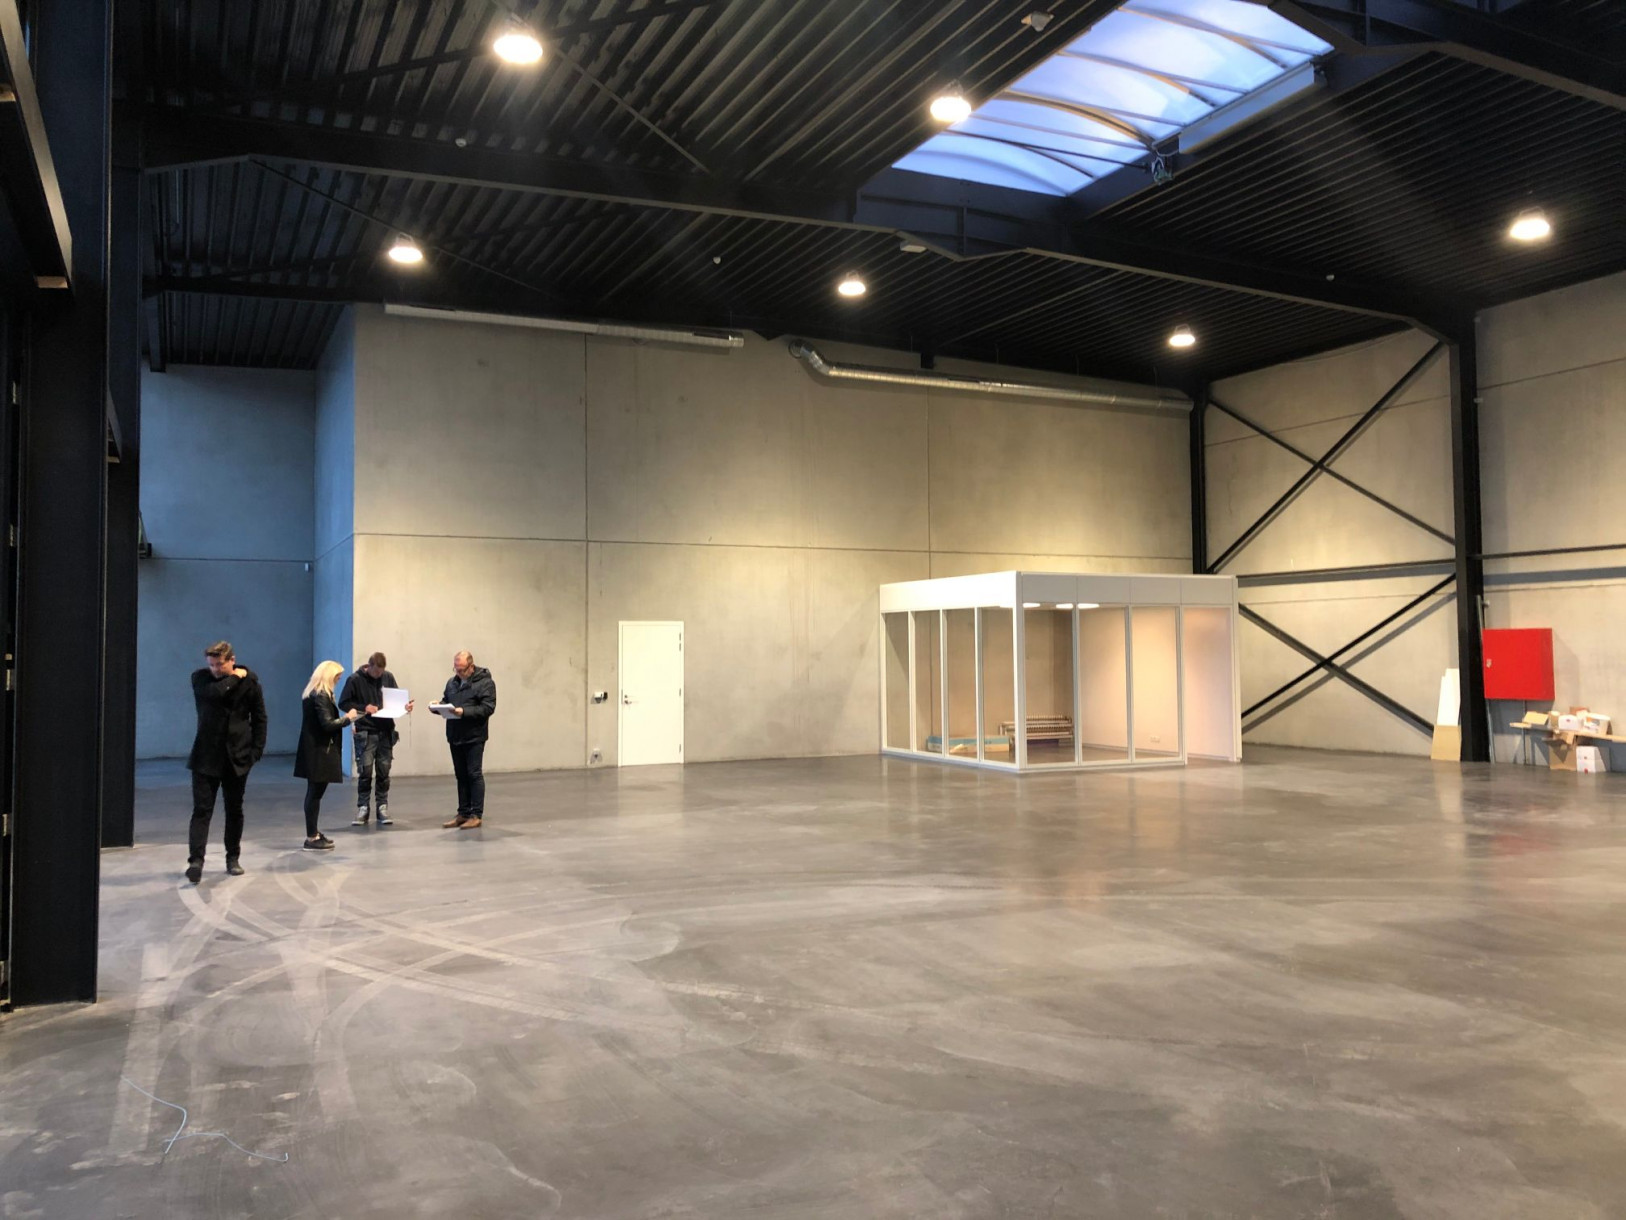 Rietveld Warehouses - Zedelgem Kuilputstraat PACKO NV (Royal Reesink Group)4